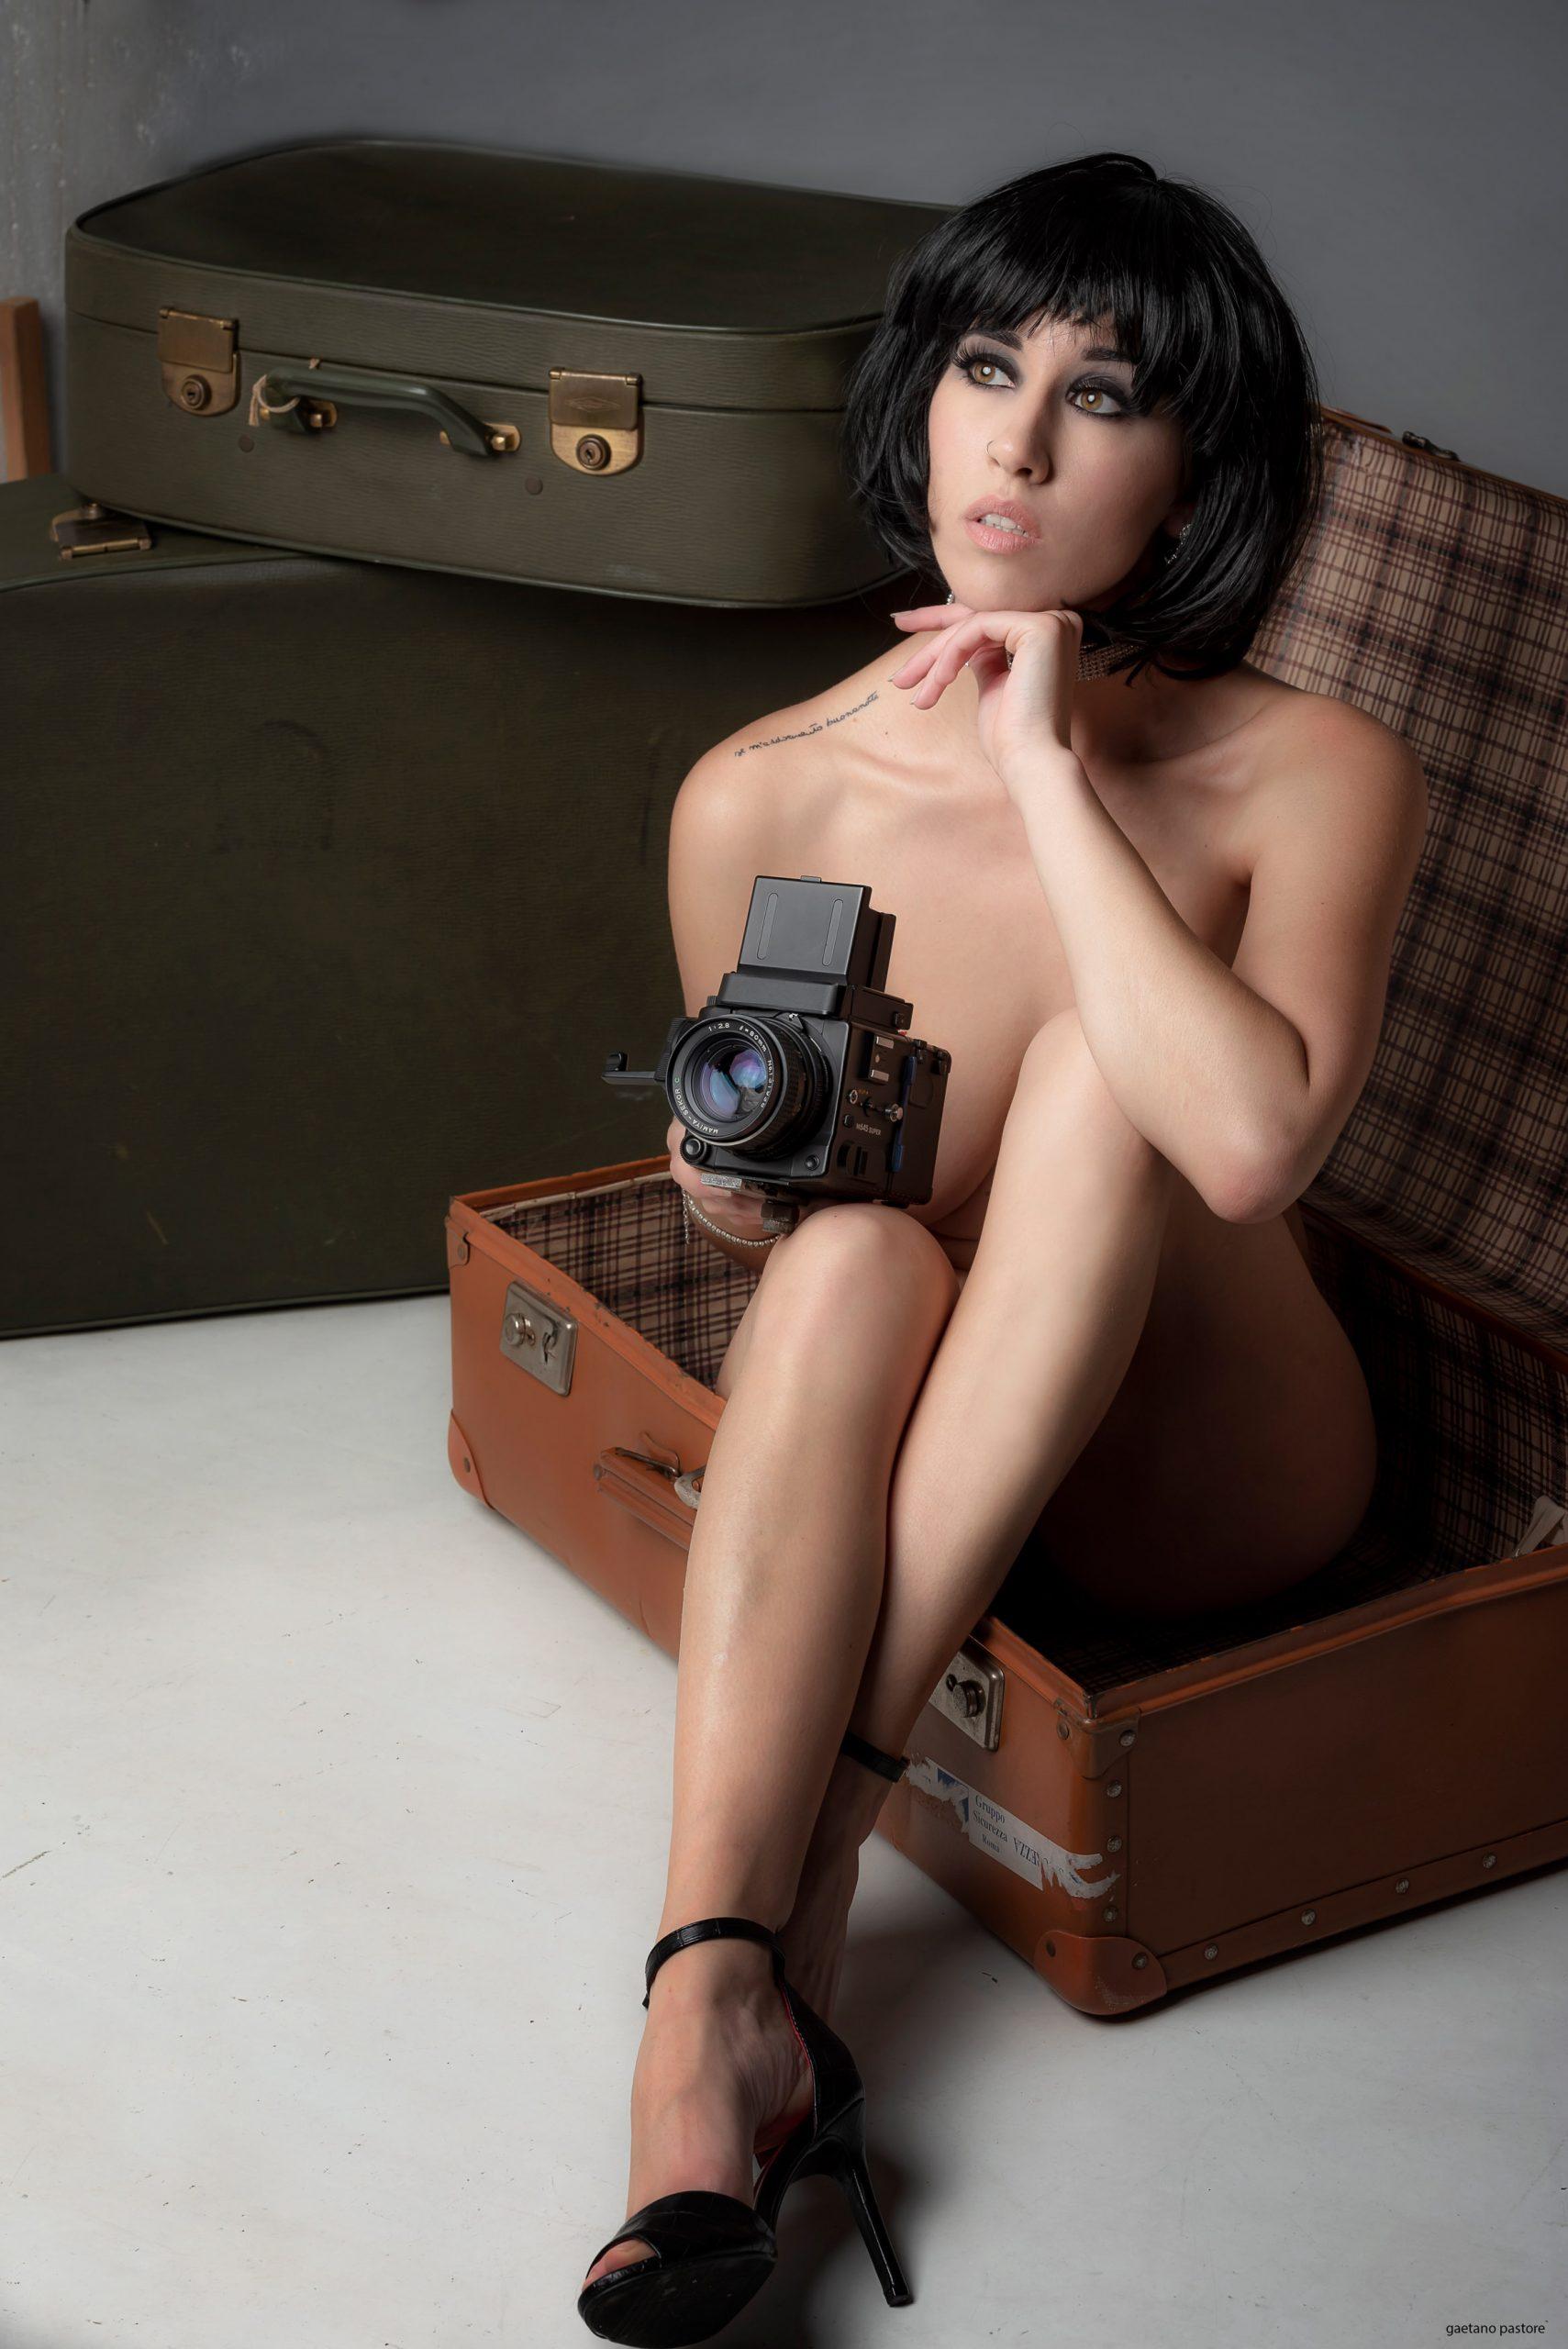 Categorie: Glamour, Portrait - Photographer: GAETANO PASTORE - Model & Dancer: AGNES VS JULIE - Location: Roma